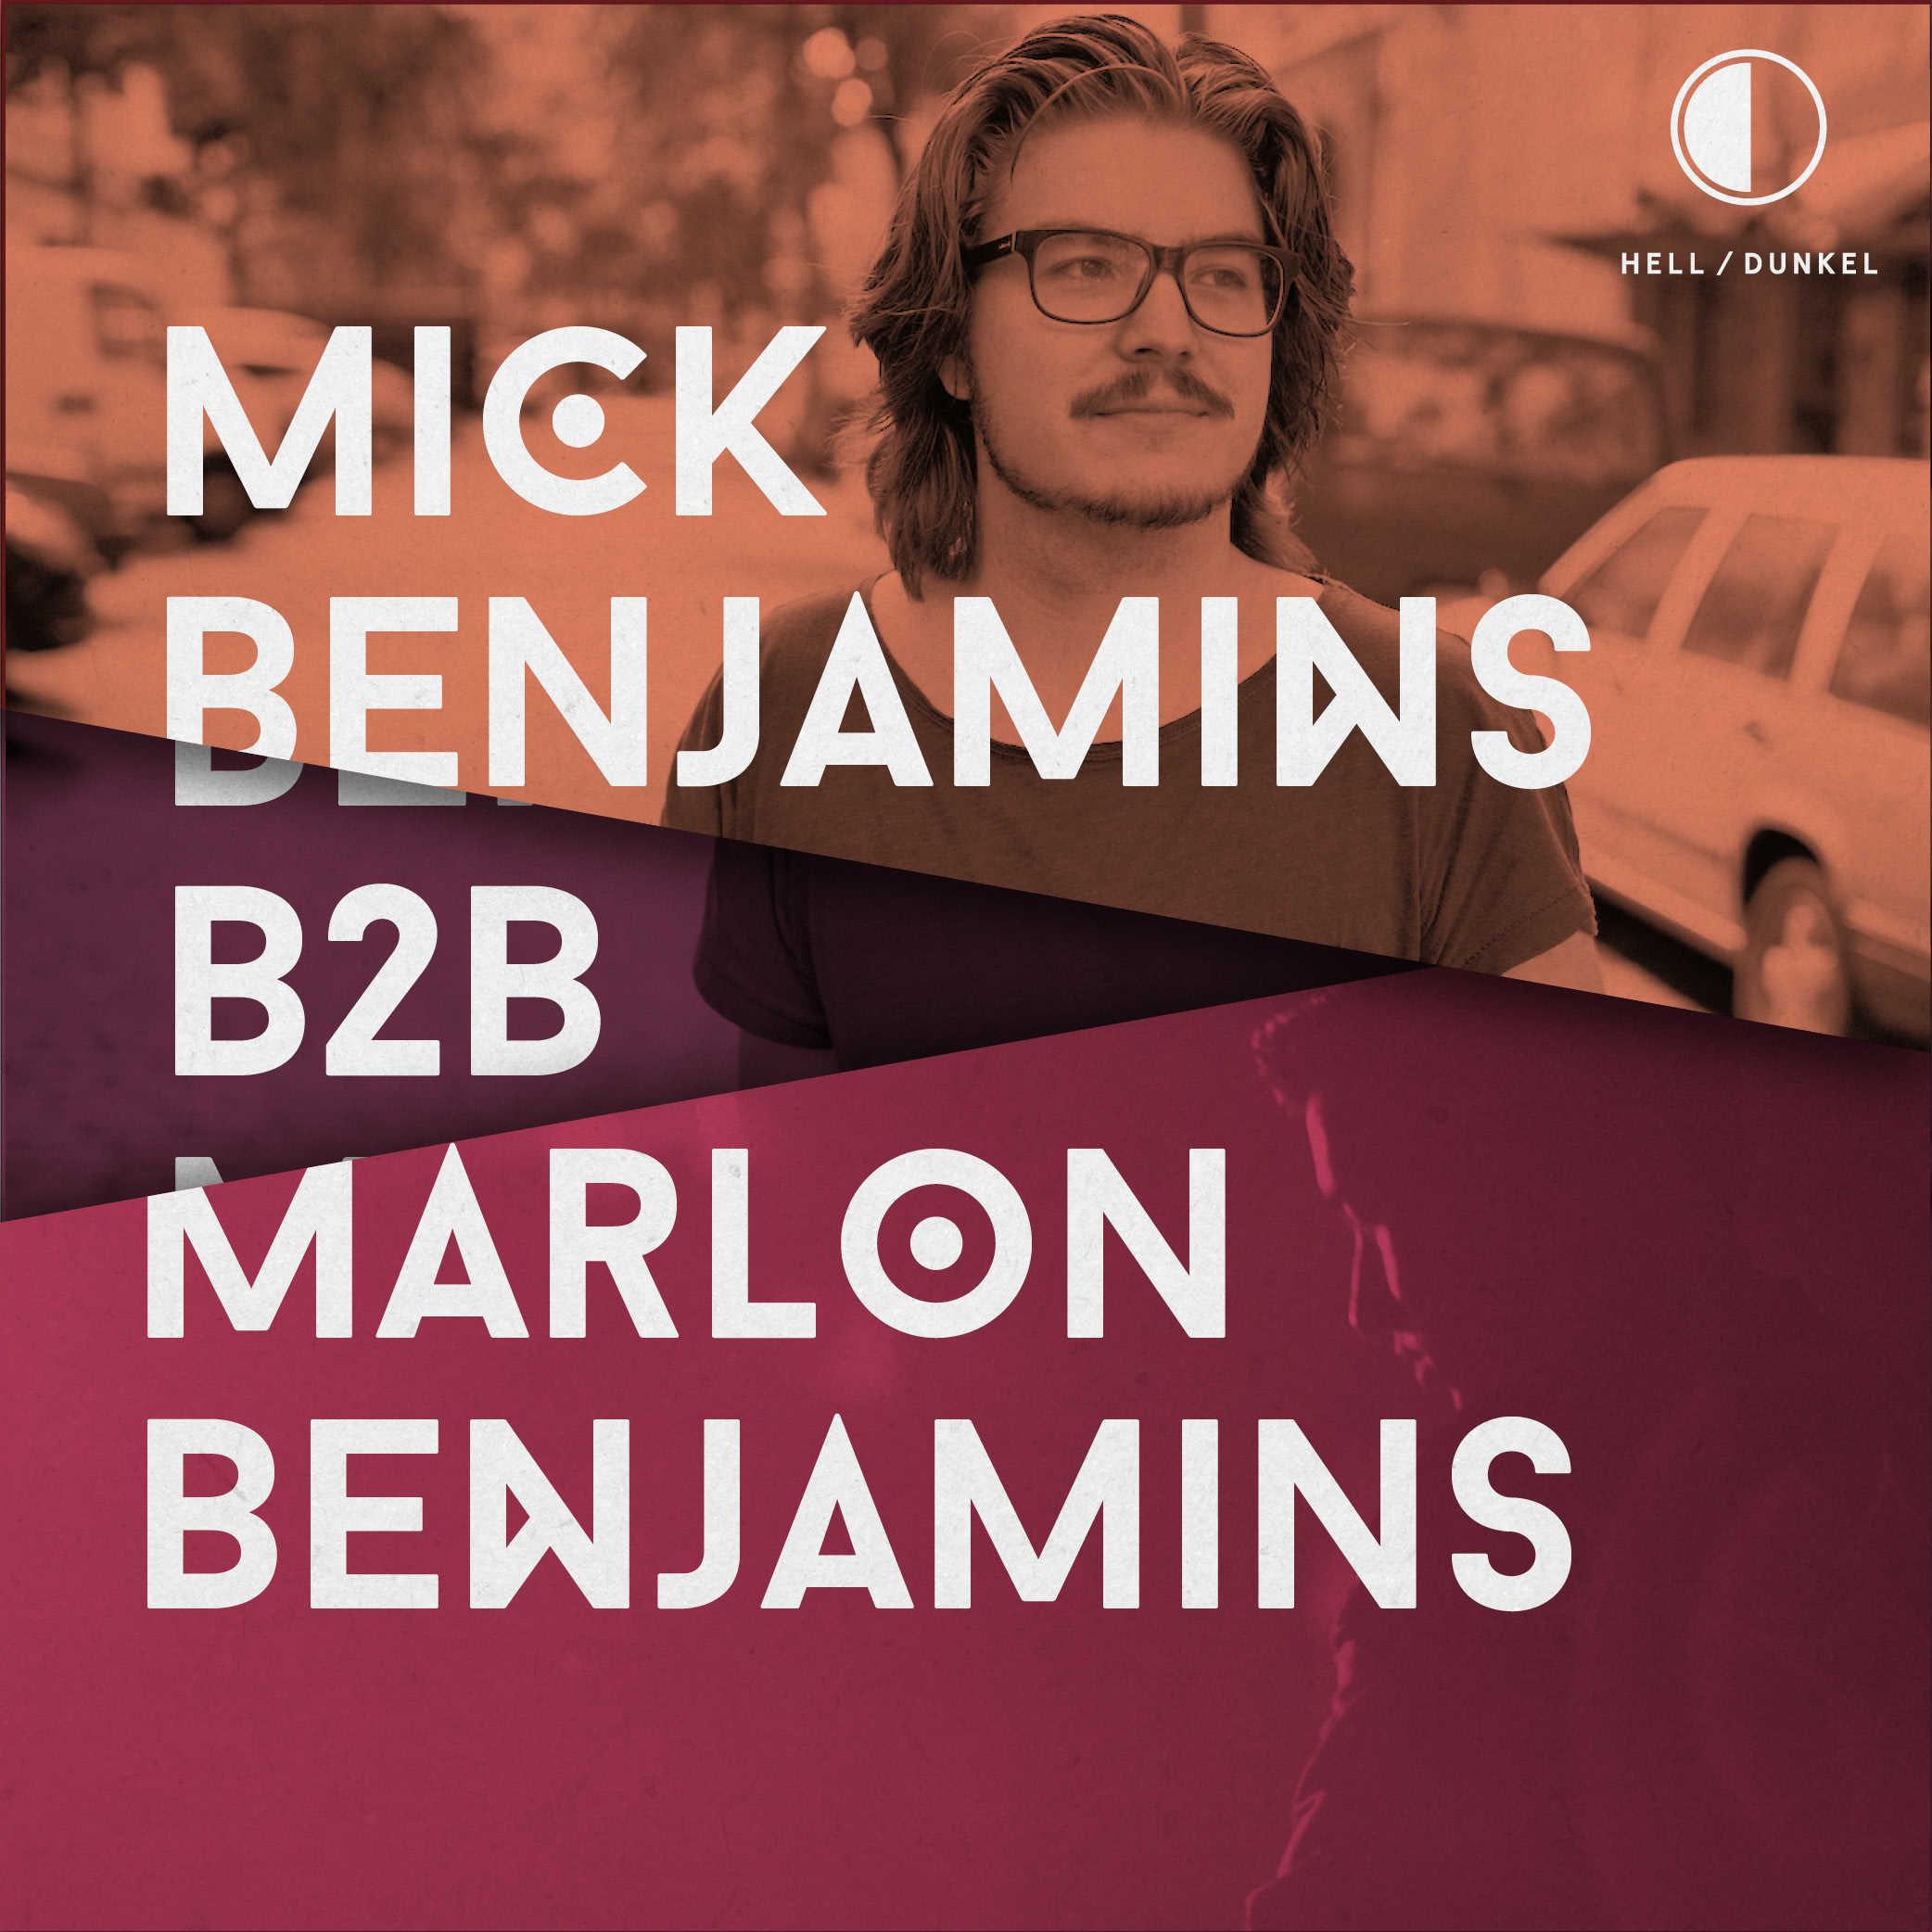 HD_Mick-Benjamins-B2B-Marlon-Benjamins